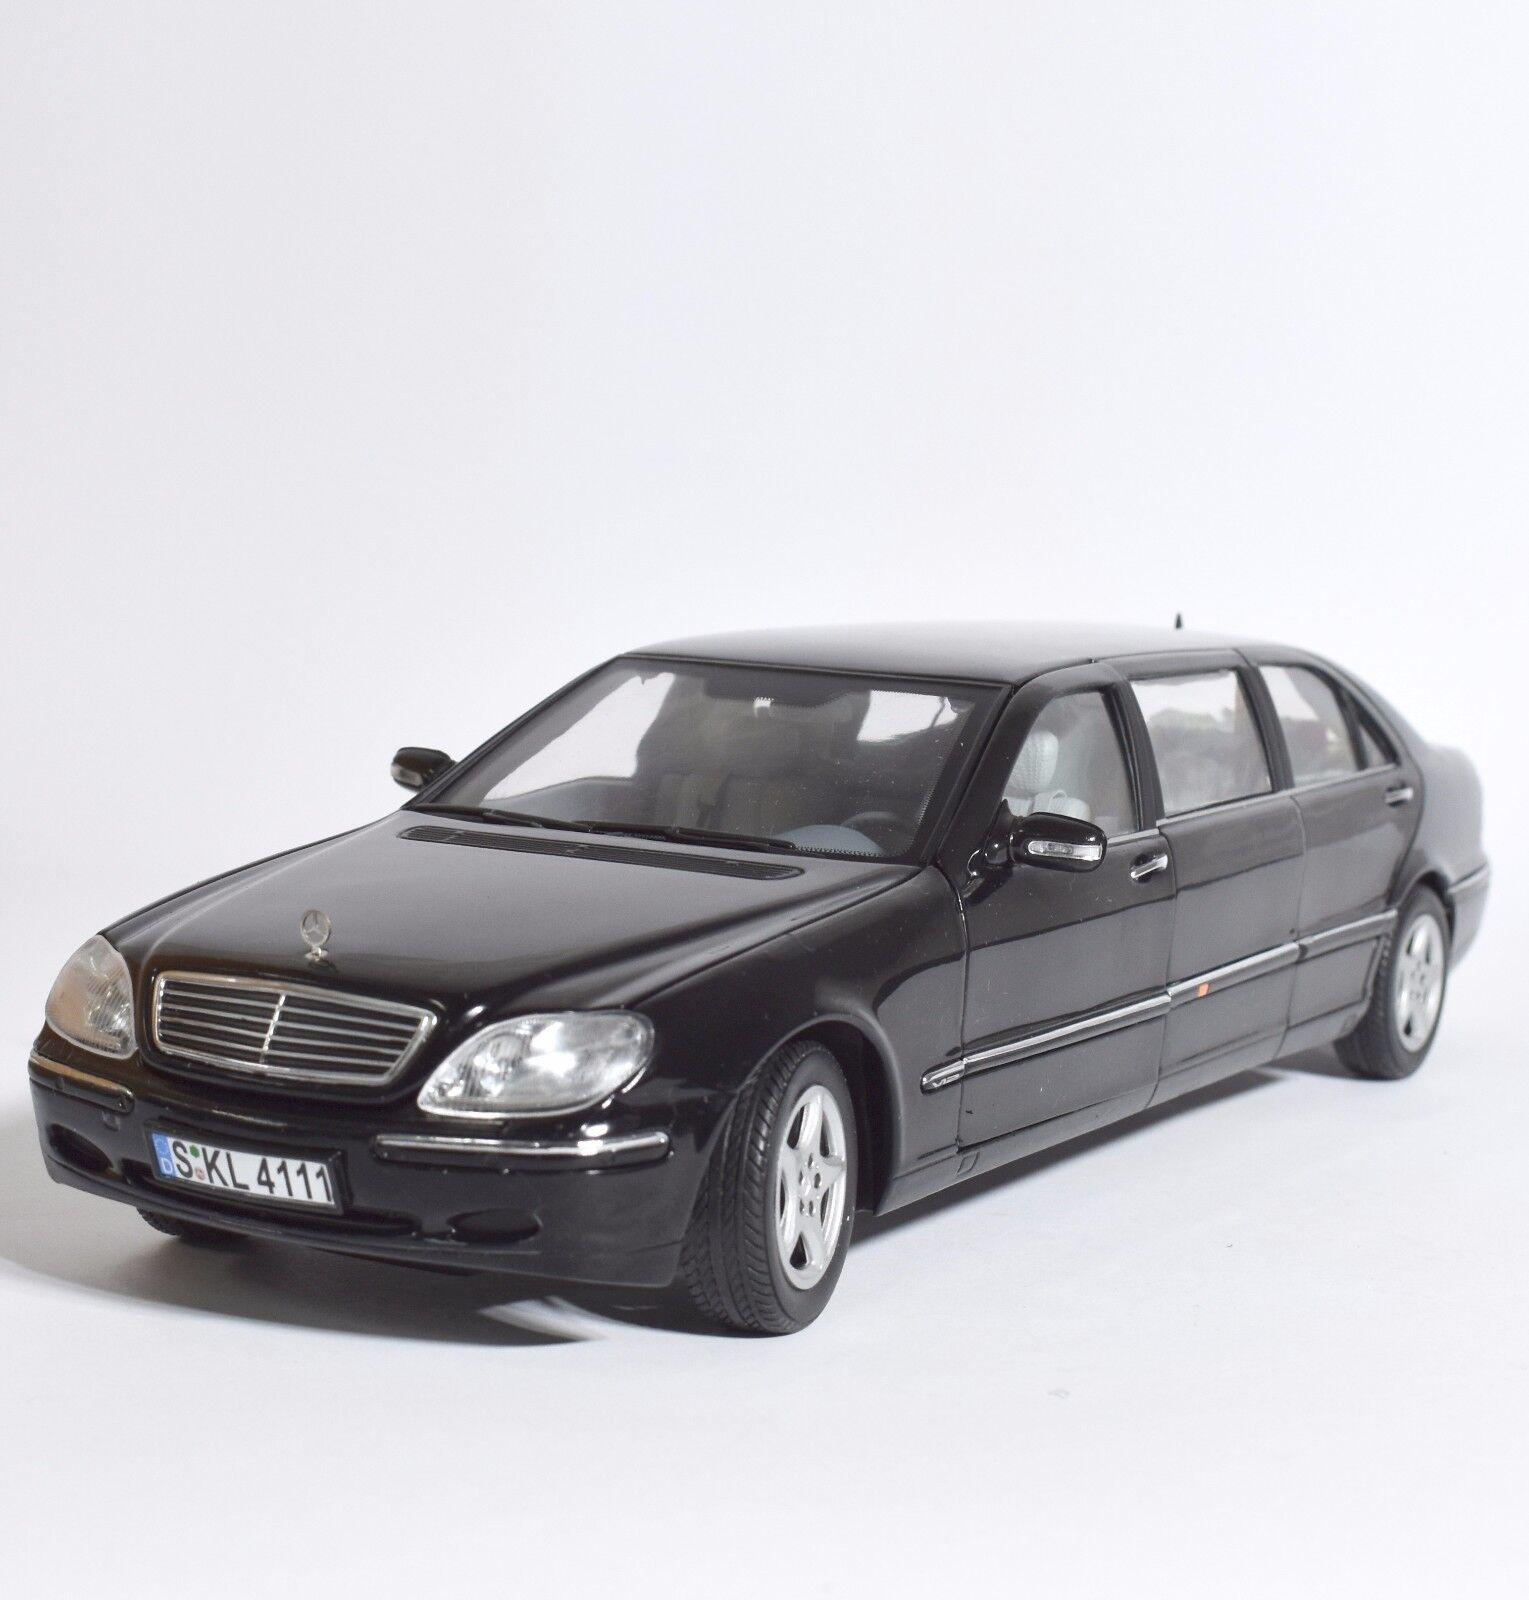 Sun star 4111 mercedes - benz 600 pullman s - klasse limousine, 18, ovp